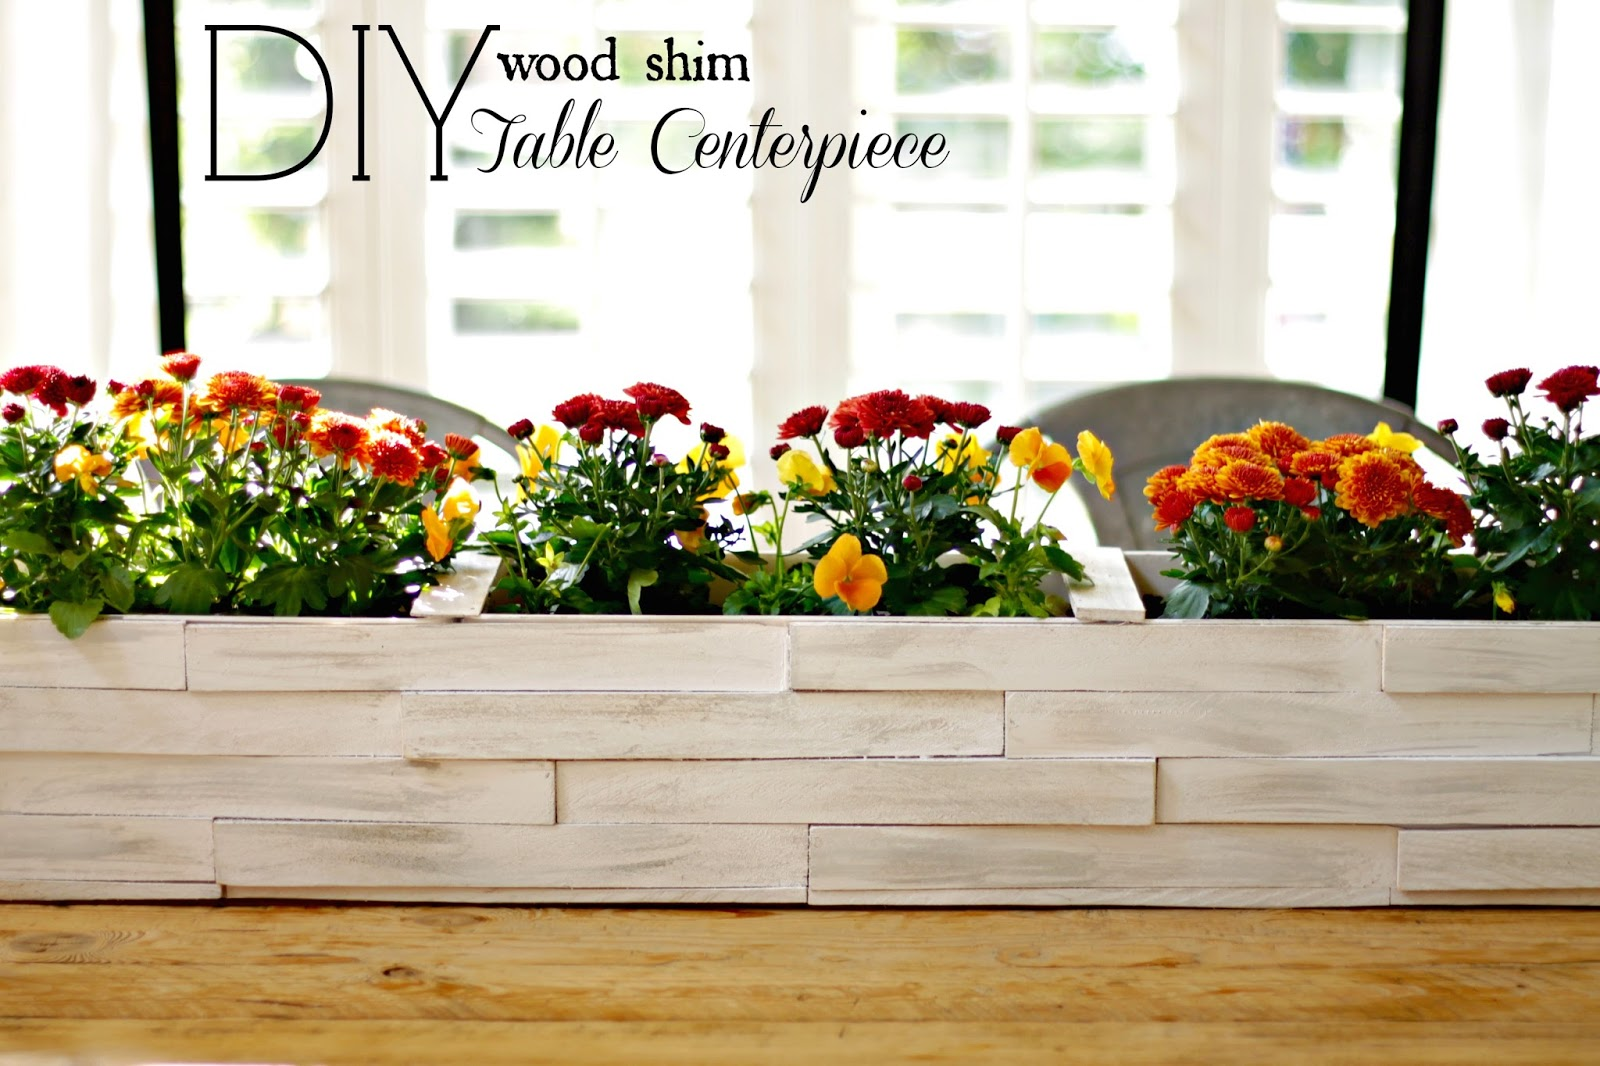 Wood Shim Project